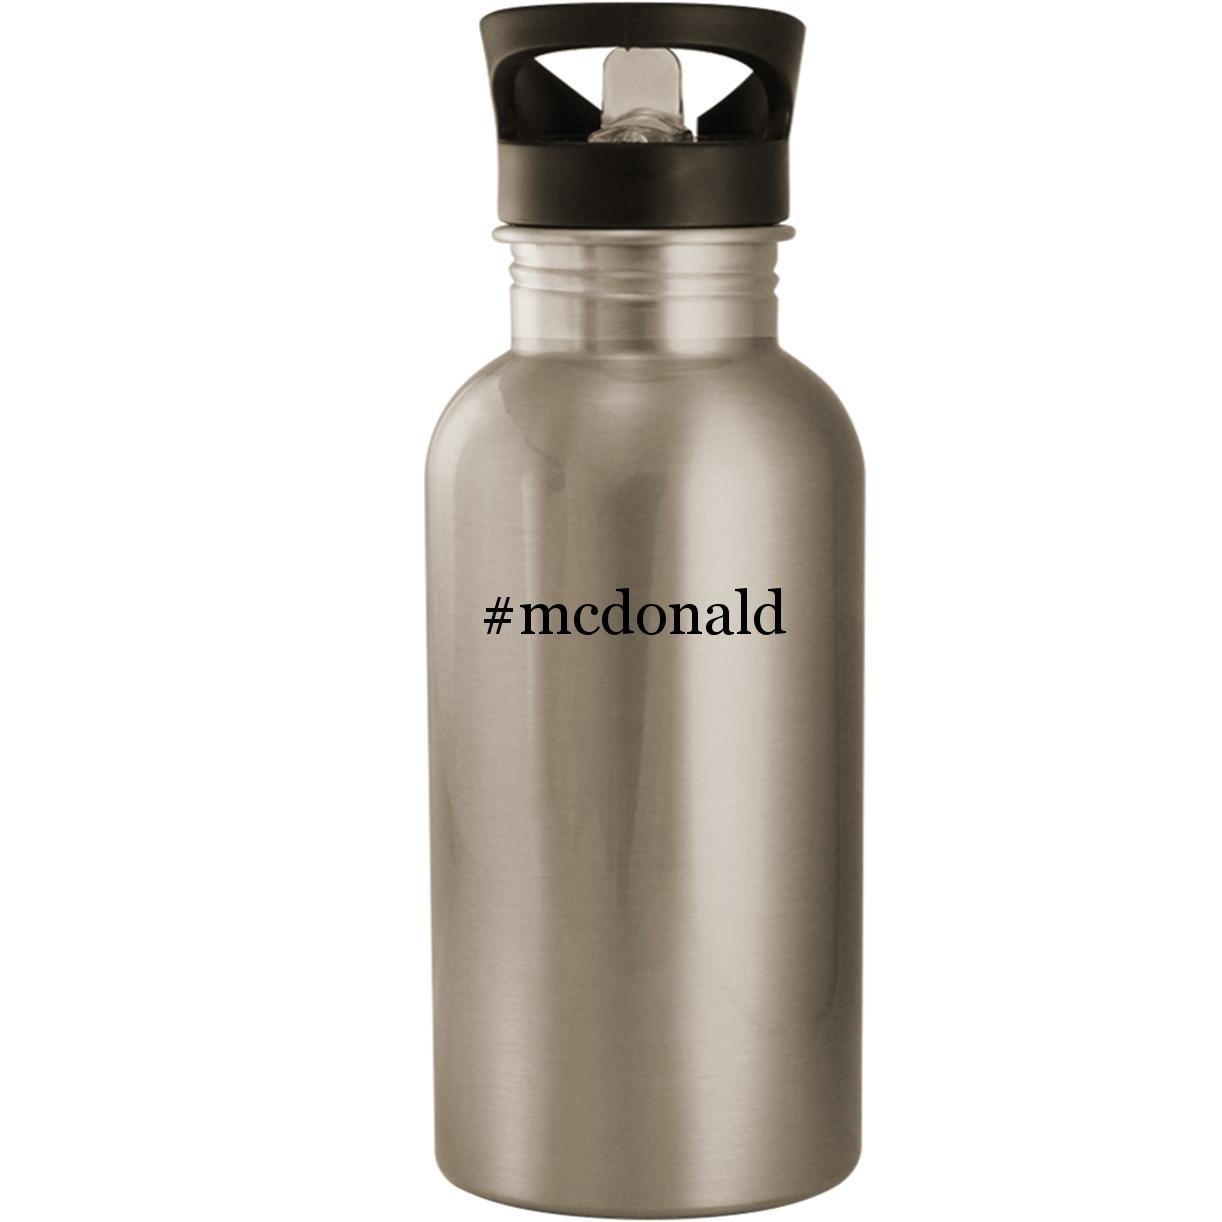 # mcdonald – ステンレススチール20oz Road Ready水ボトル シルバー US-C-07-18-02-079794-04-26-18-26 B07FT6LBQG シルバー